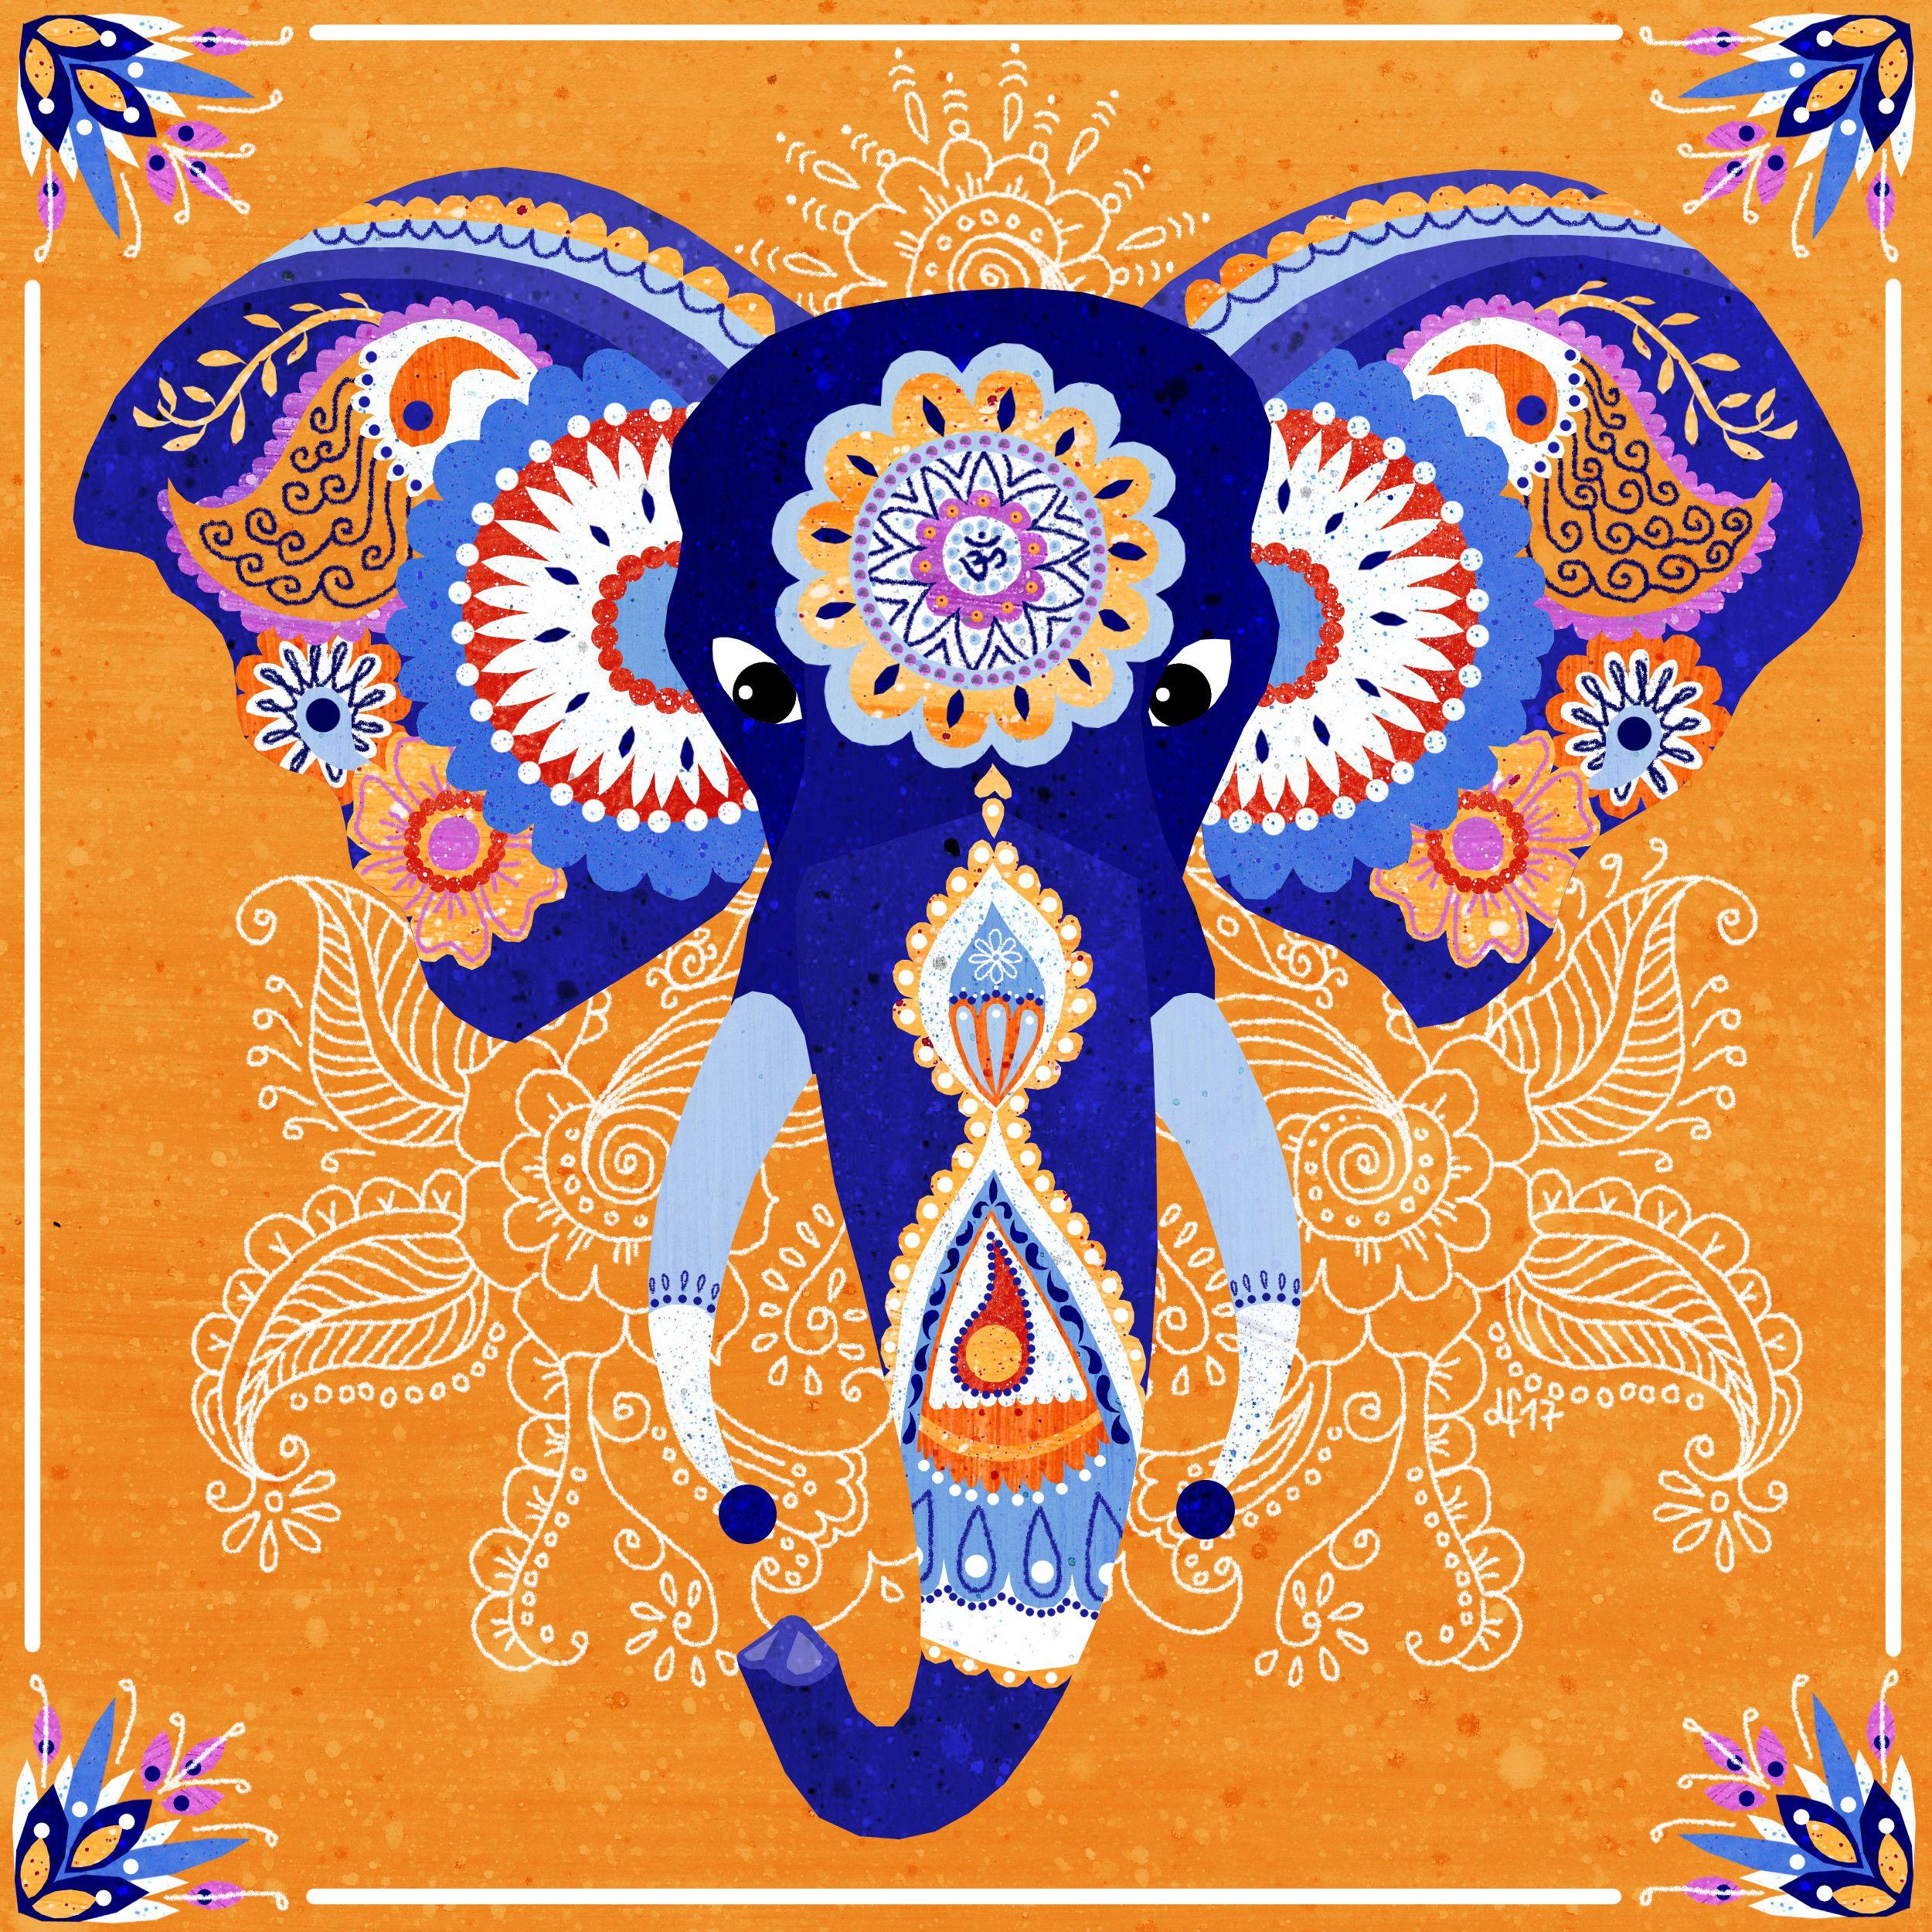 Indian Elephant illustration by Daniela Faber 2017 blue